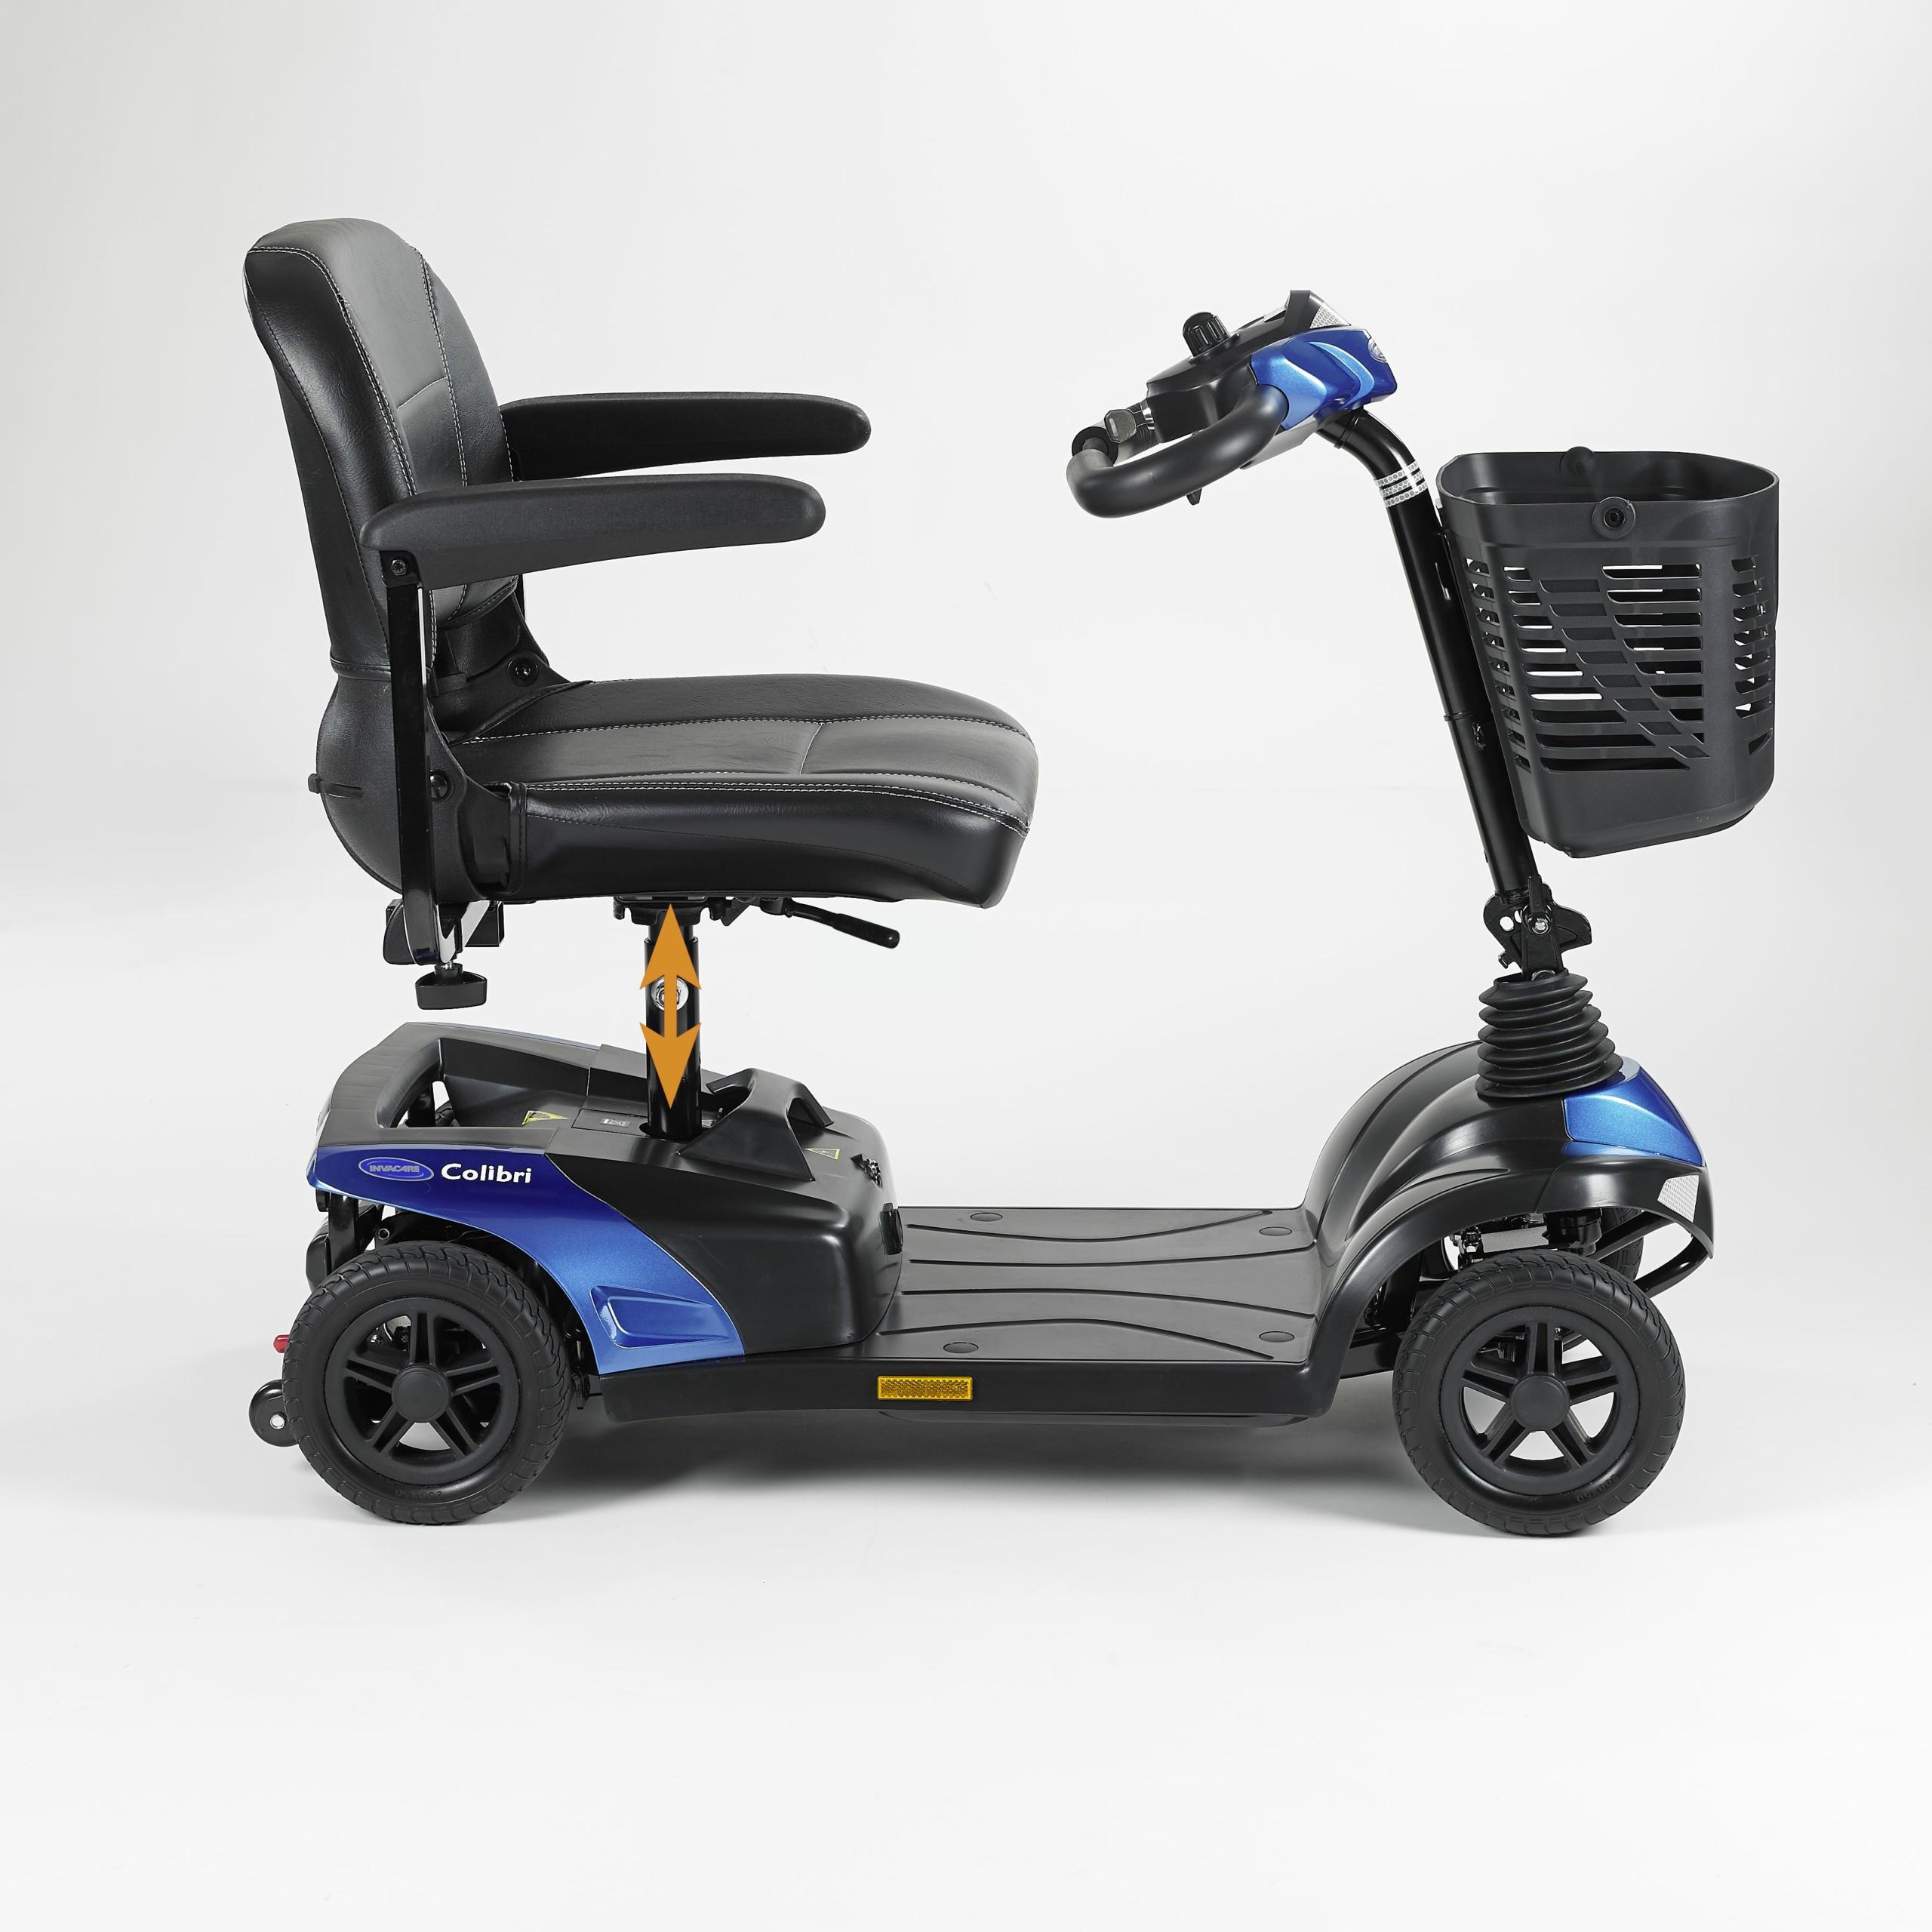 Jegge bewegt - Seniorenmobil - Colibri